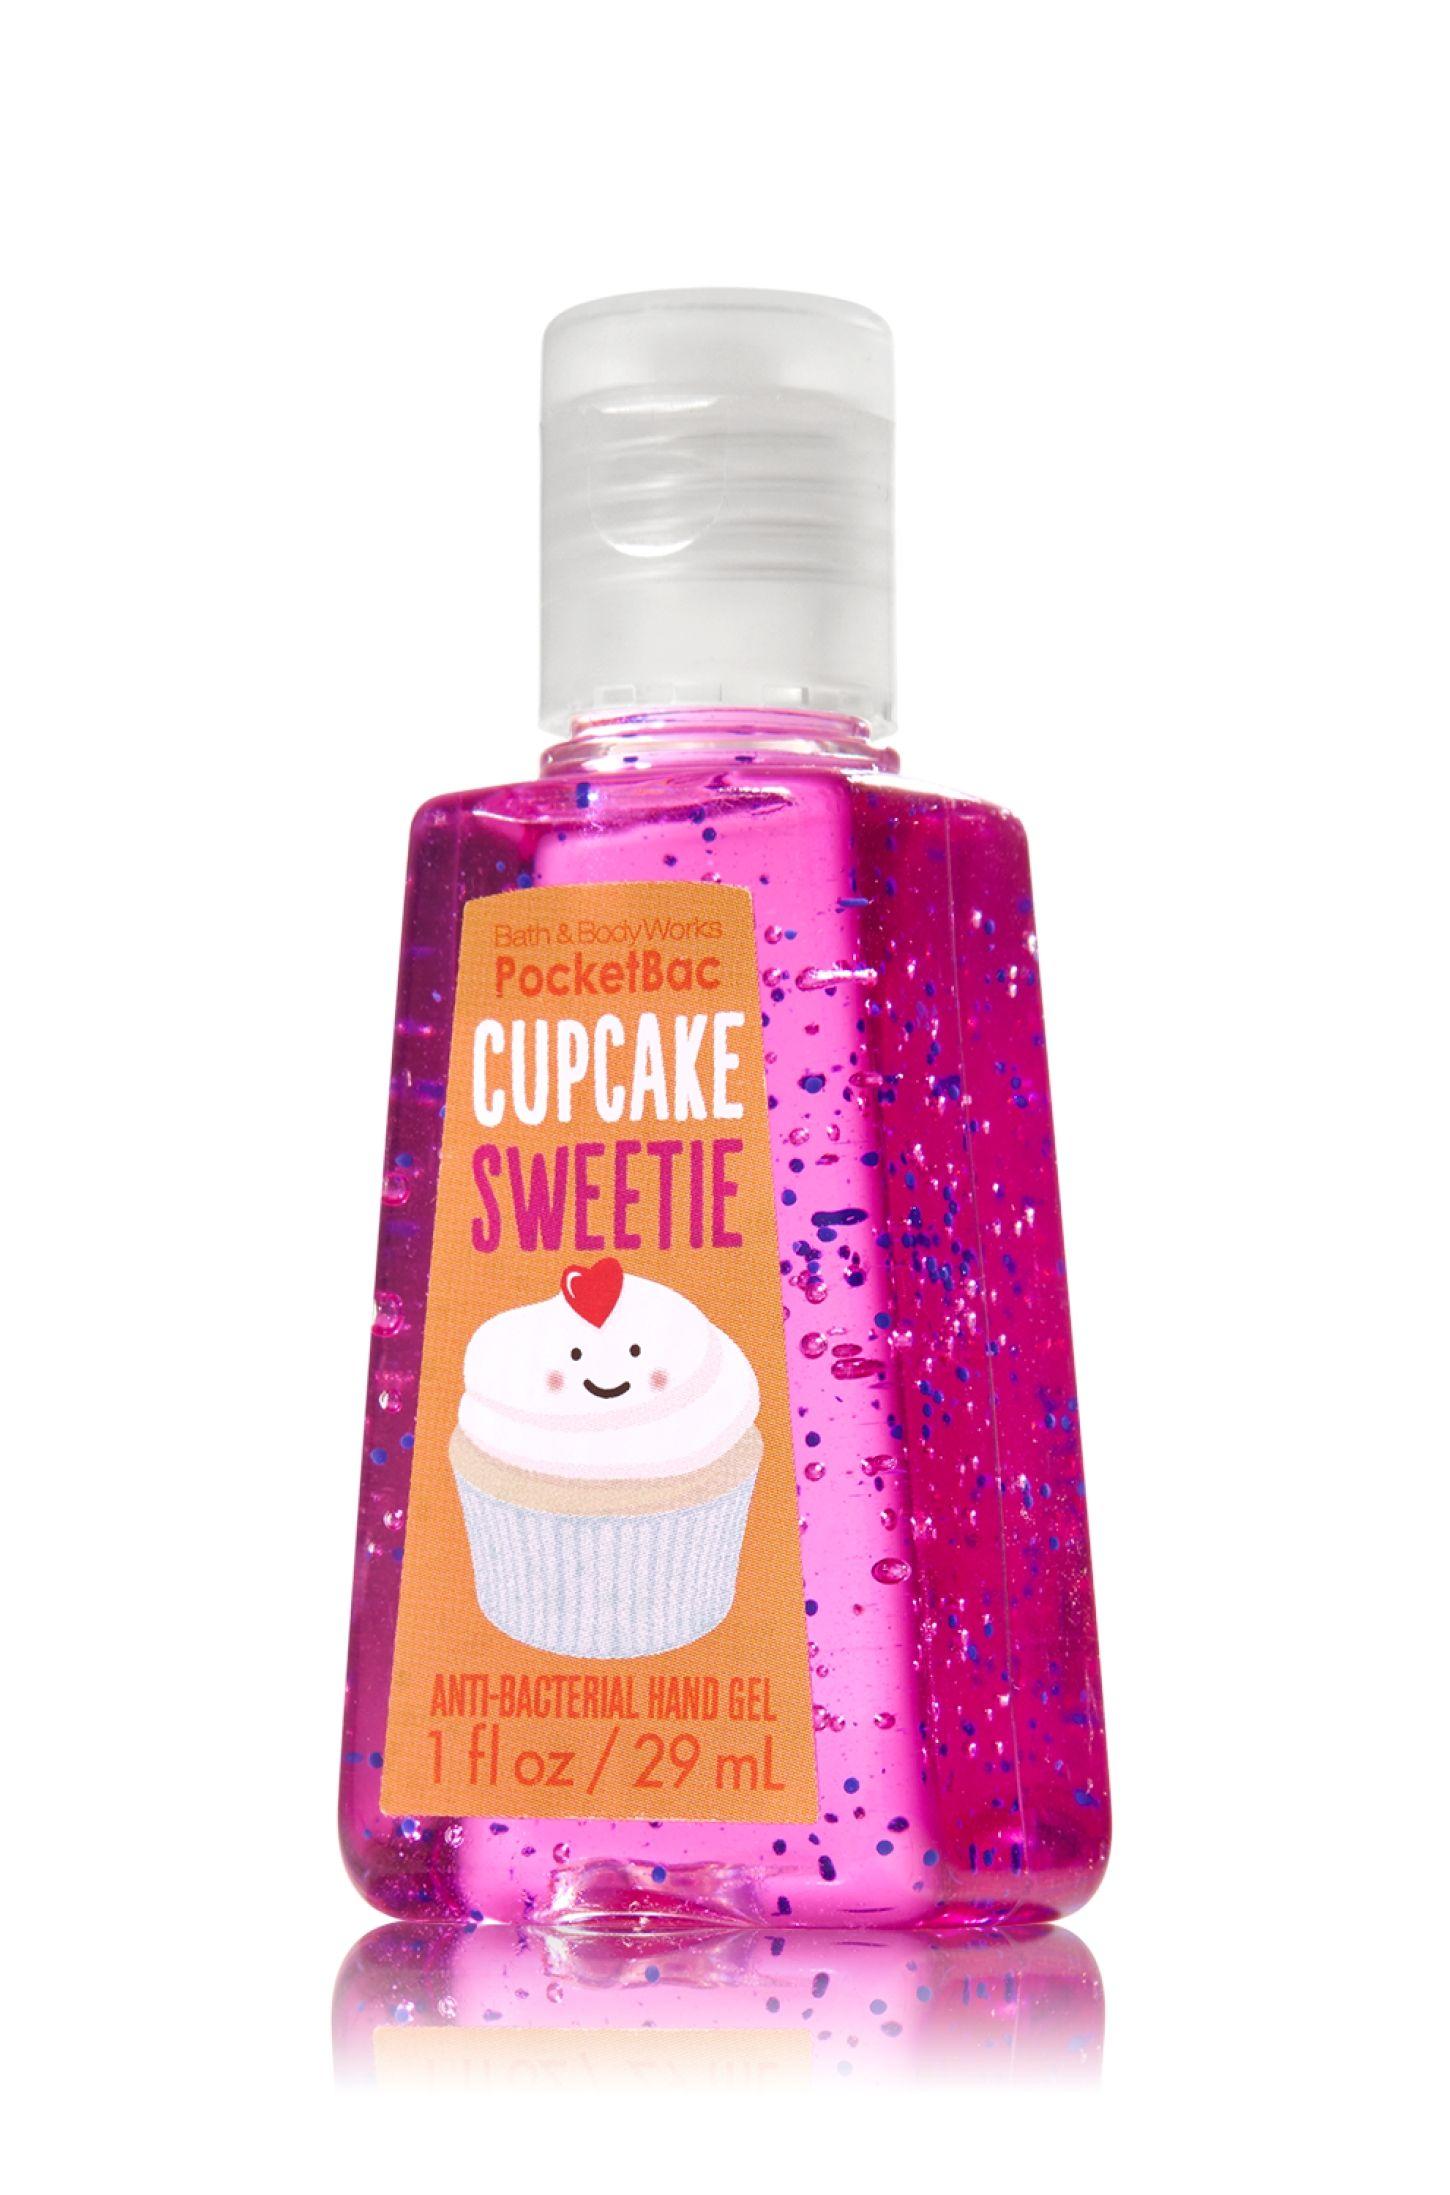 Cupcake Sweetie Bath Body Works Pocketbac Sanitizing Hand Gel